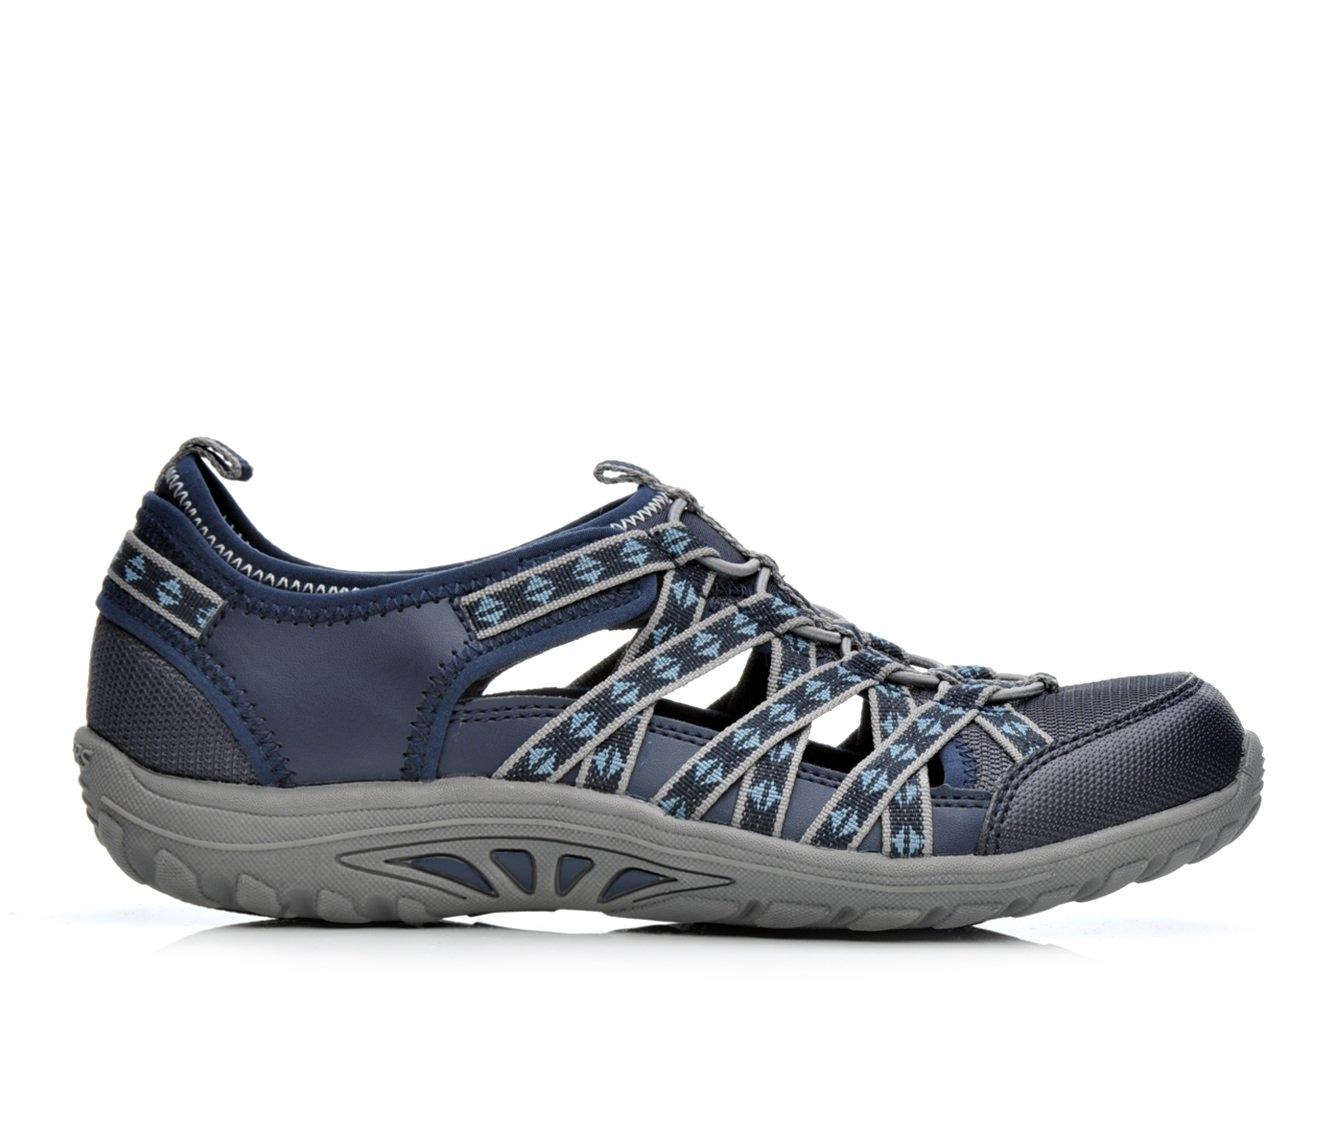 Women's Skechers Dory 49359 Sandals (Blue)